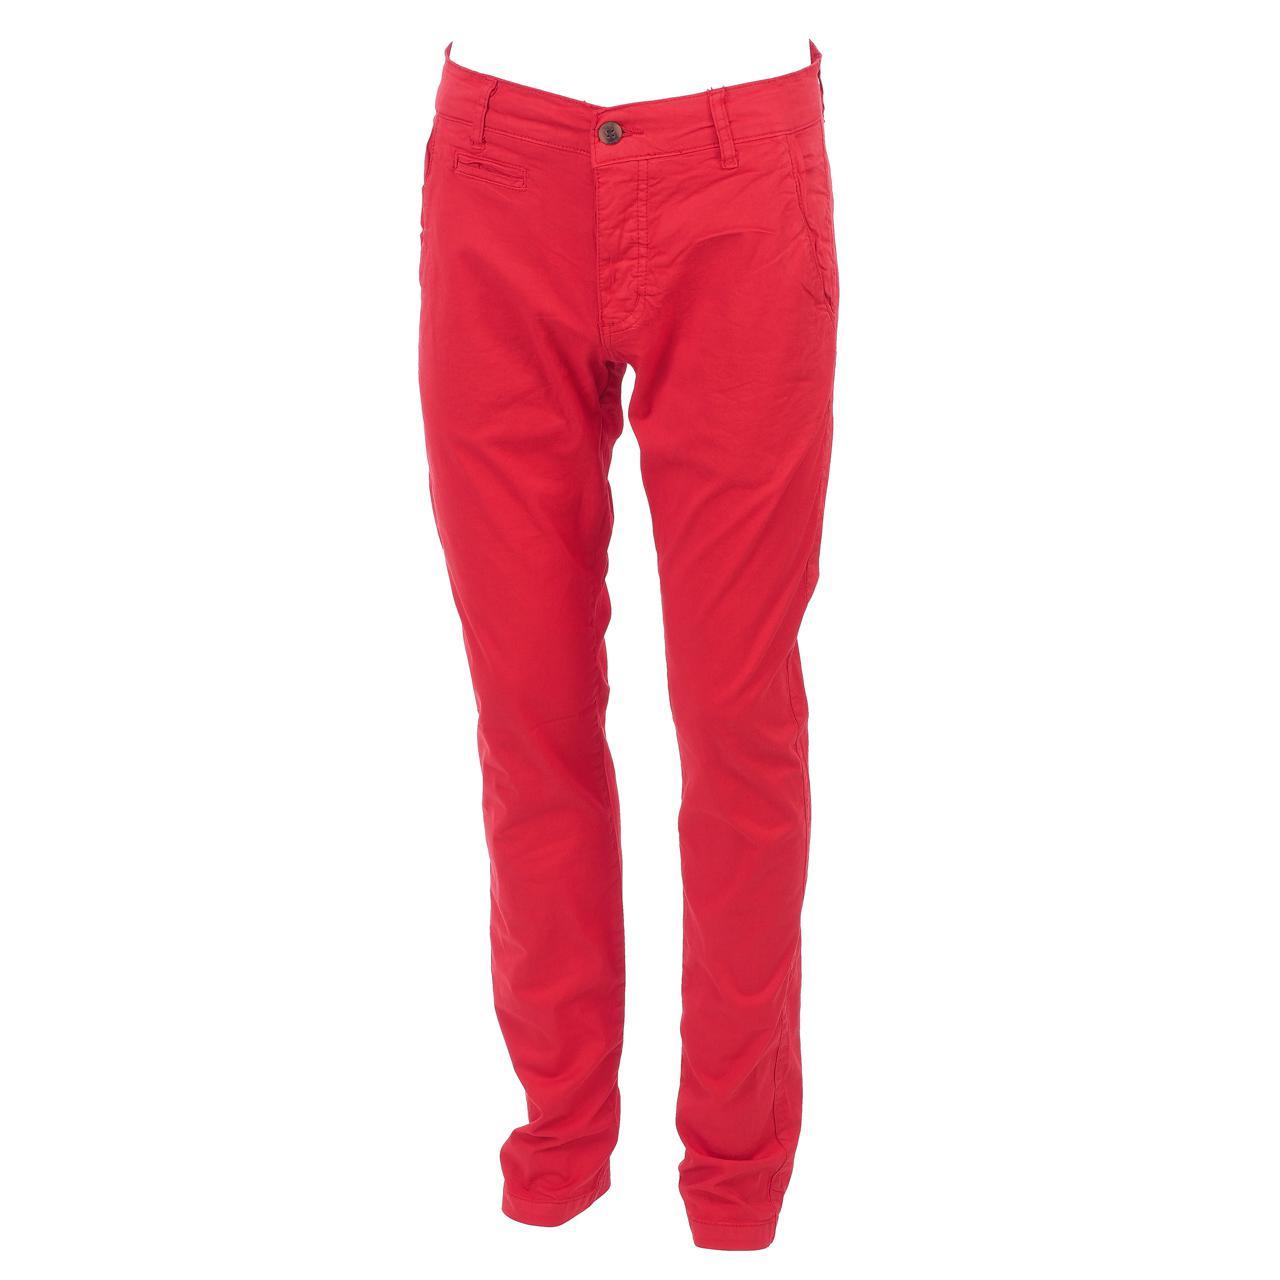 Hose-Biaggio-Tarel-Rot-Hose-Chino-Rot-22256-Neu